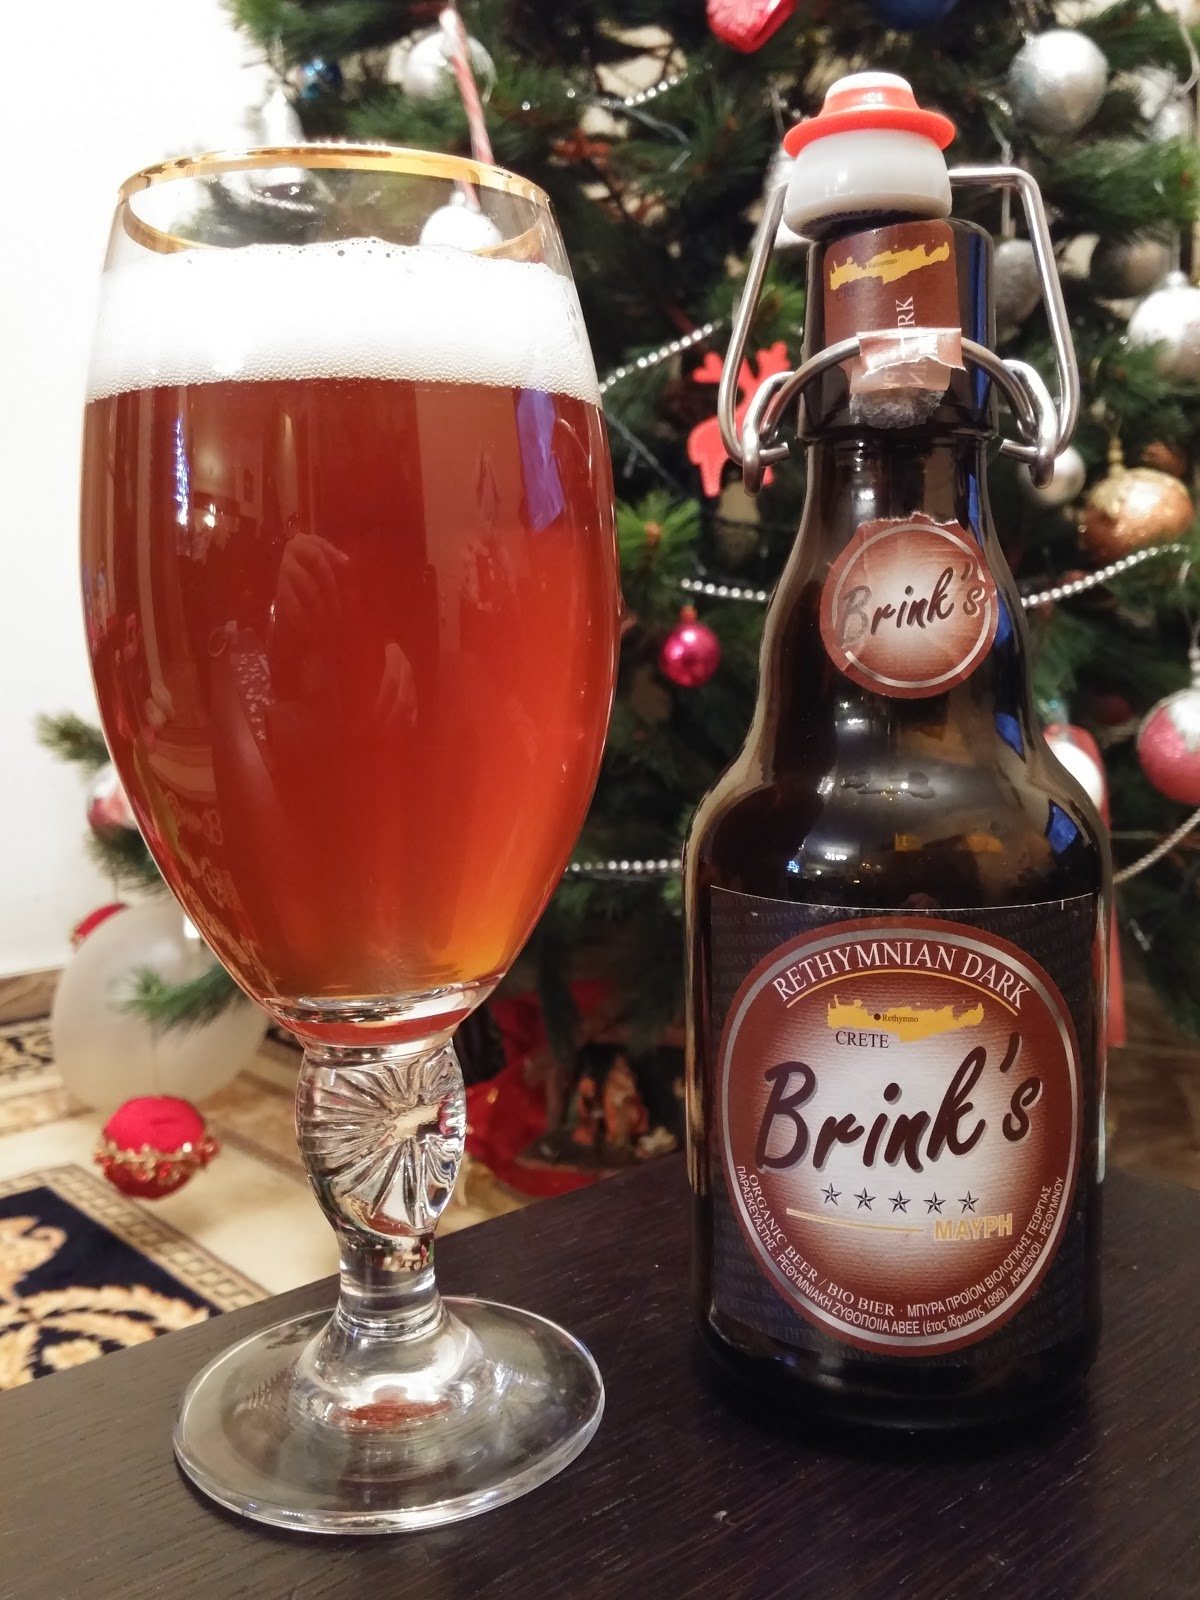 brinks beer crete